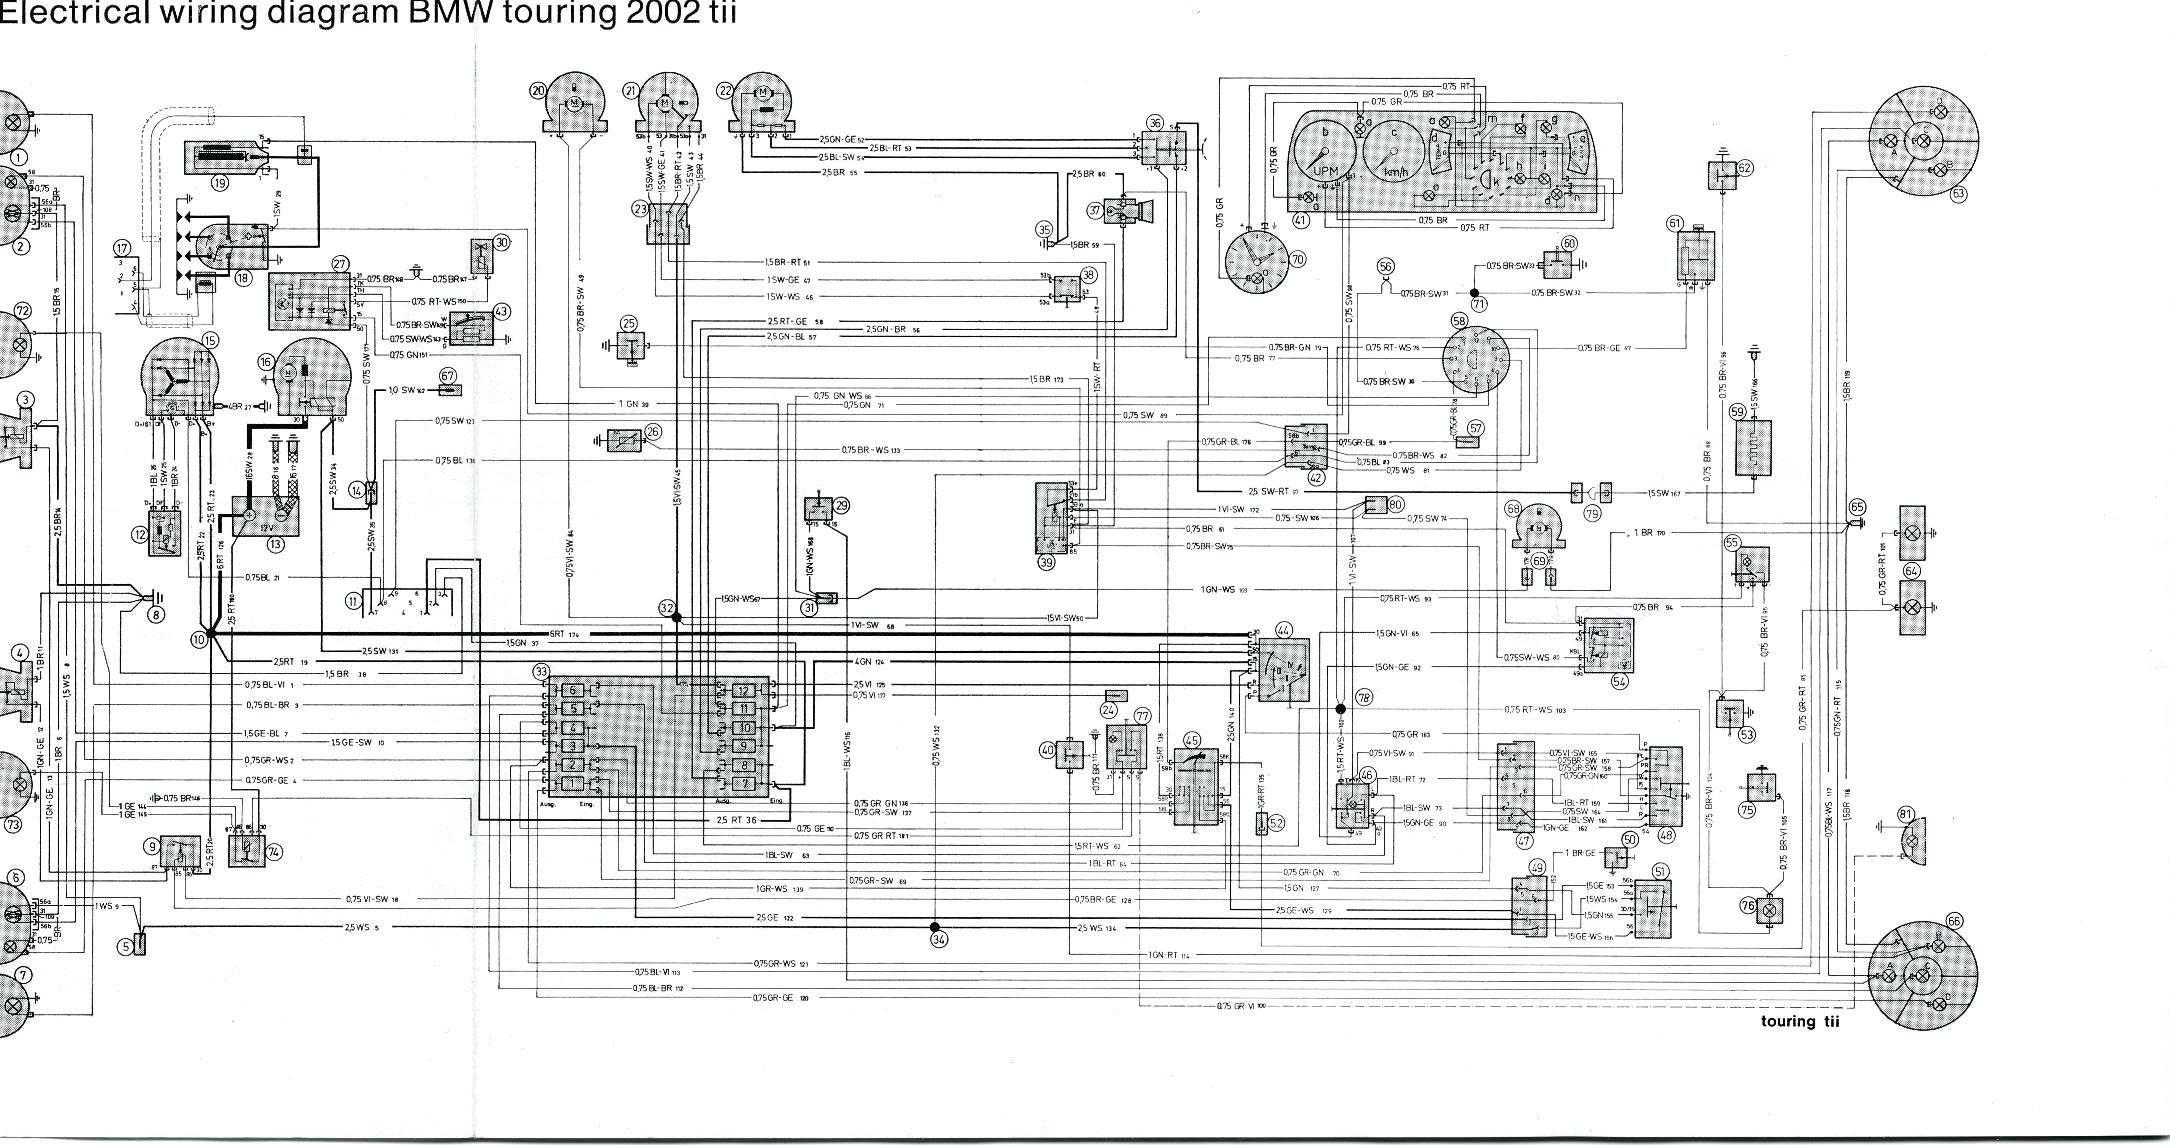 new bmw e46 seat wiring diagram diagram diagramtemplatenew bmw e46 seat wiring diagram diagram diagramtemplate diagramsample [ 2170 x 1145 Pixel ]